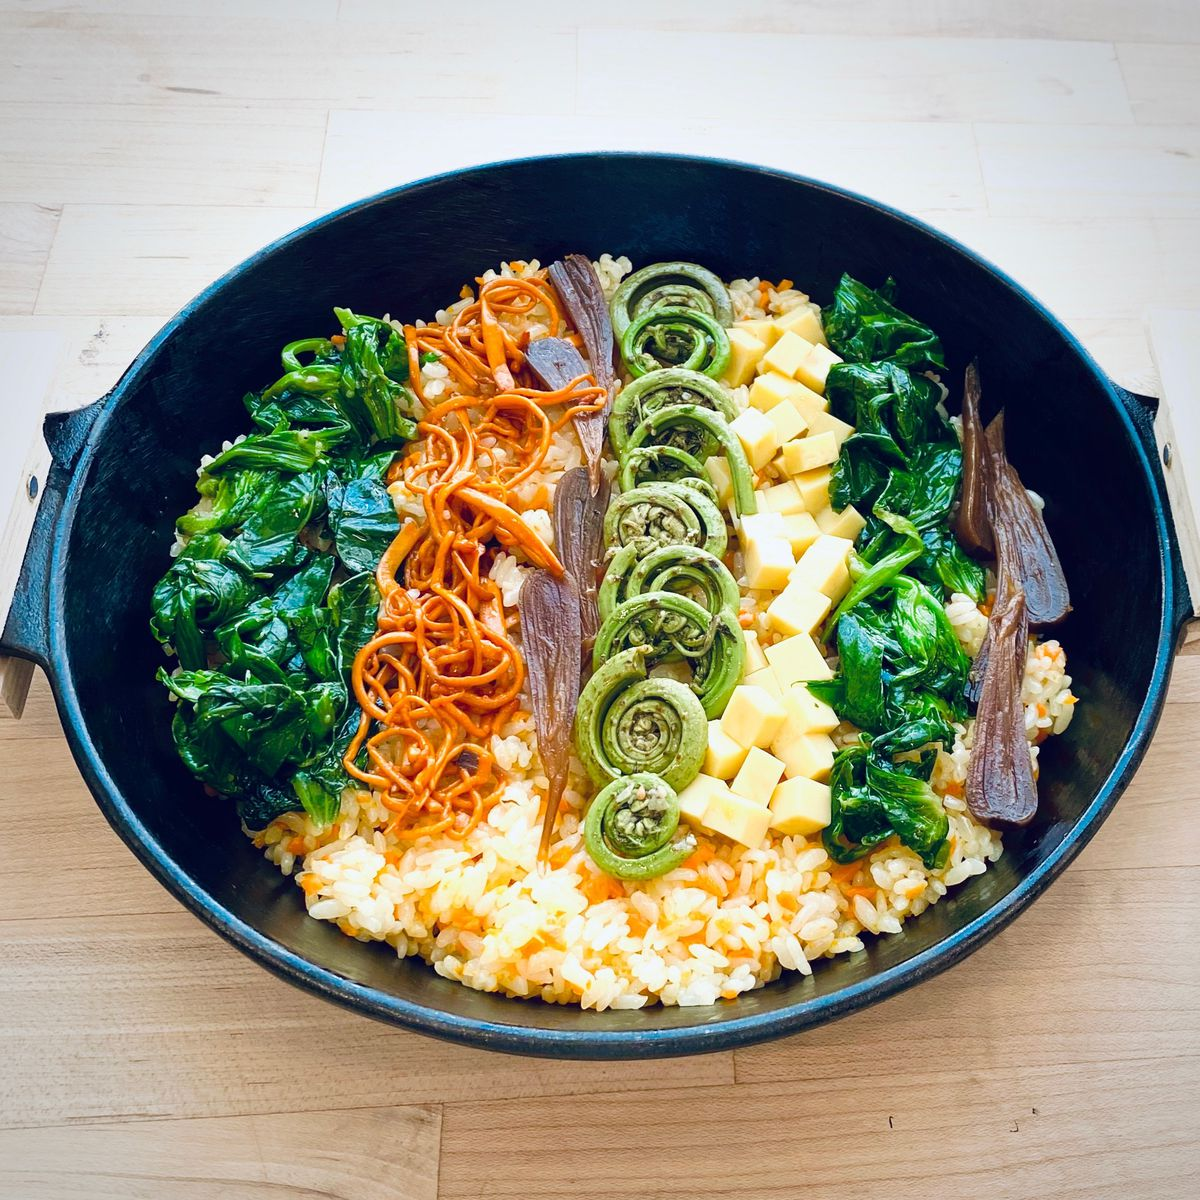 San Ho Won's spring bibimbap with ramps, fern, cordyceps, and pea leaves